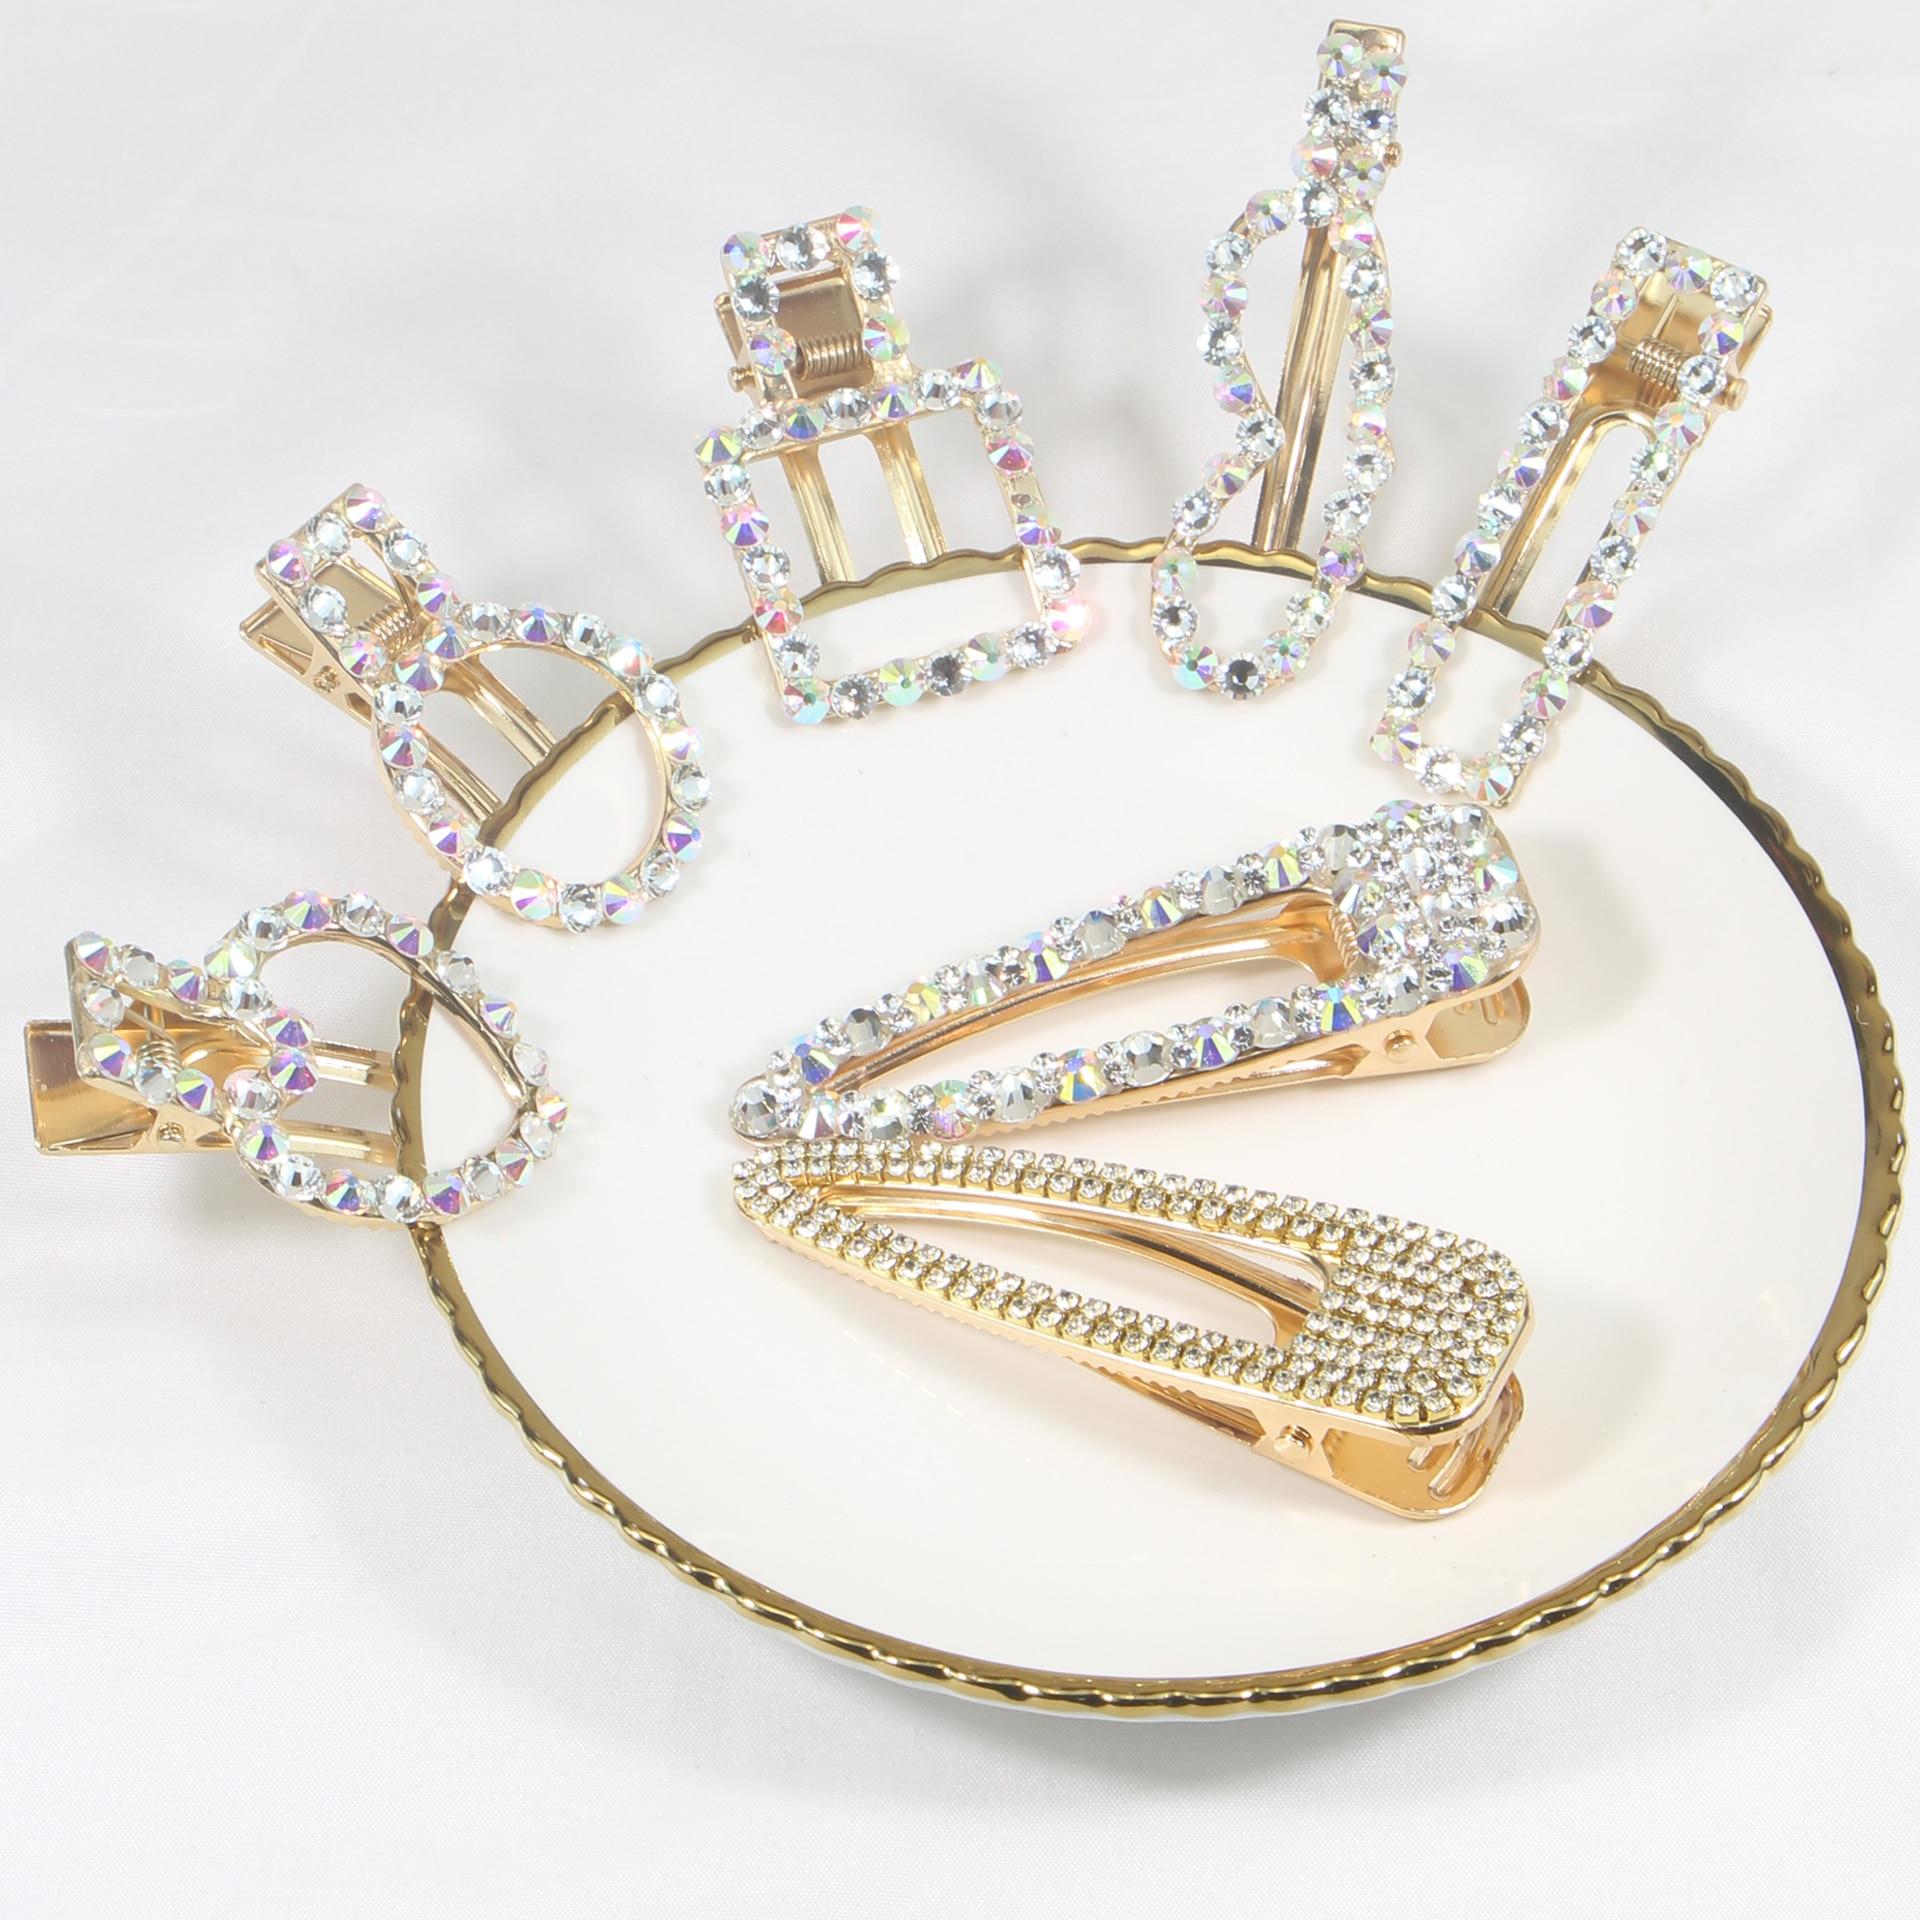 Fashion Luxury Hairpin Women Barrette  Geometric Waterdrop Hair Clip Hairgrip For Women Girls Hair Accessories